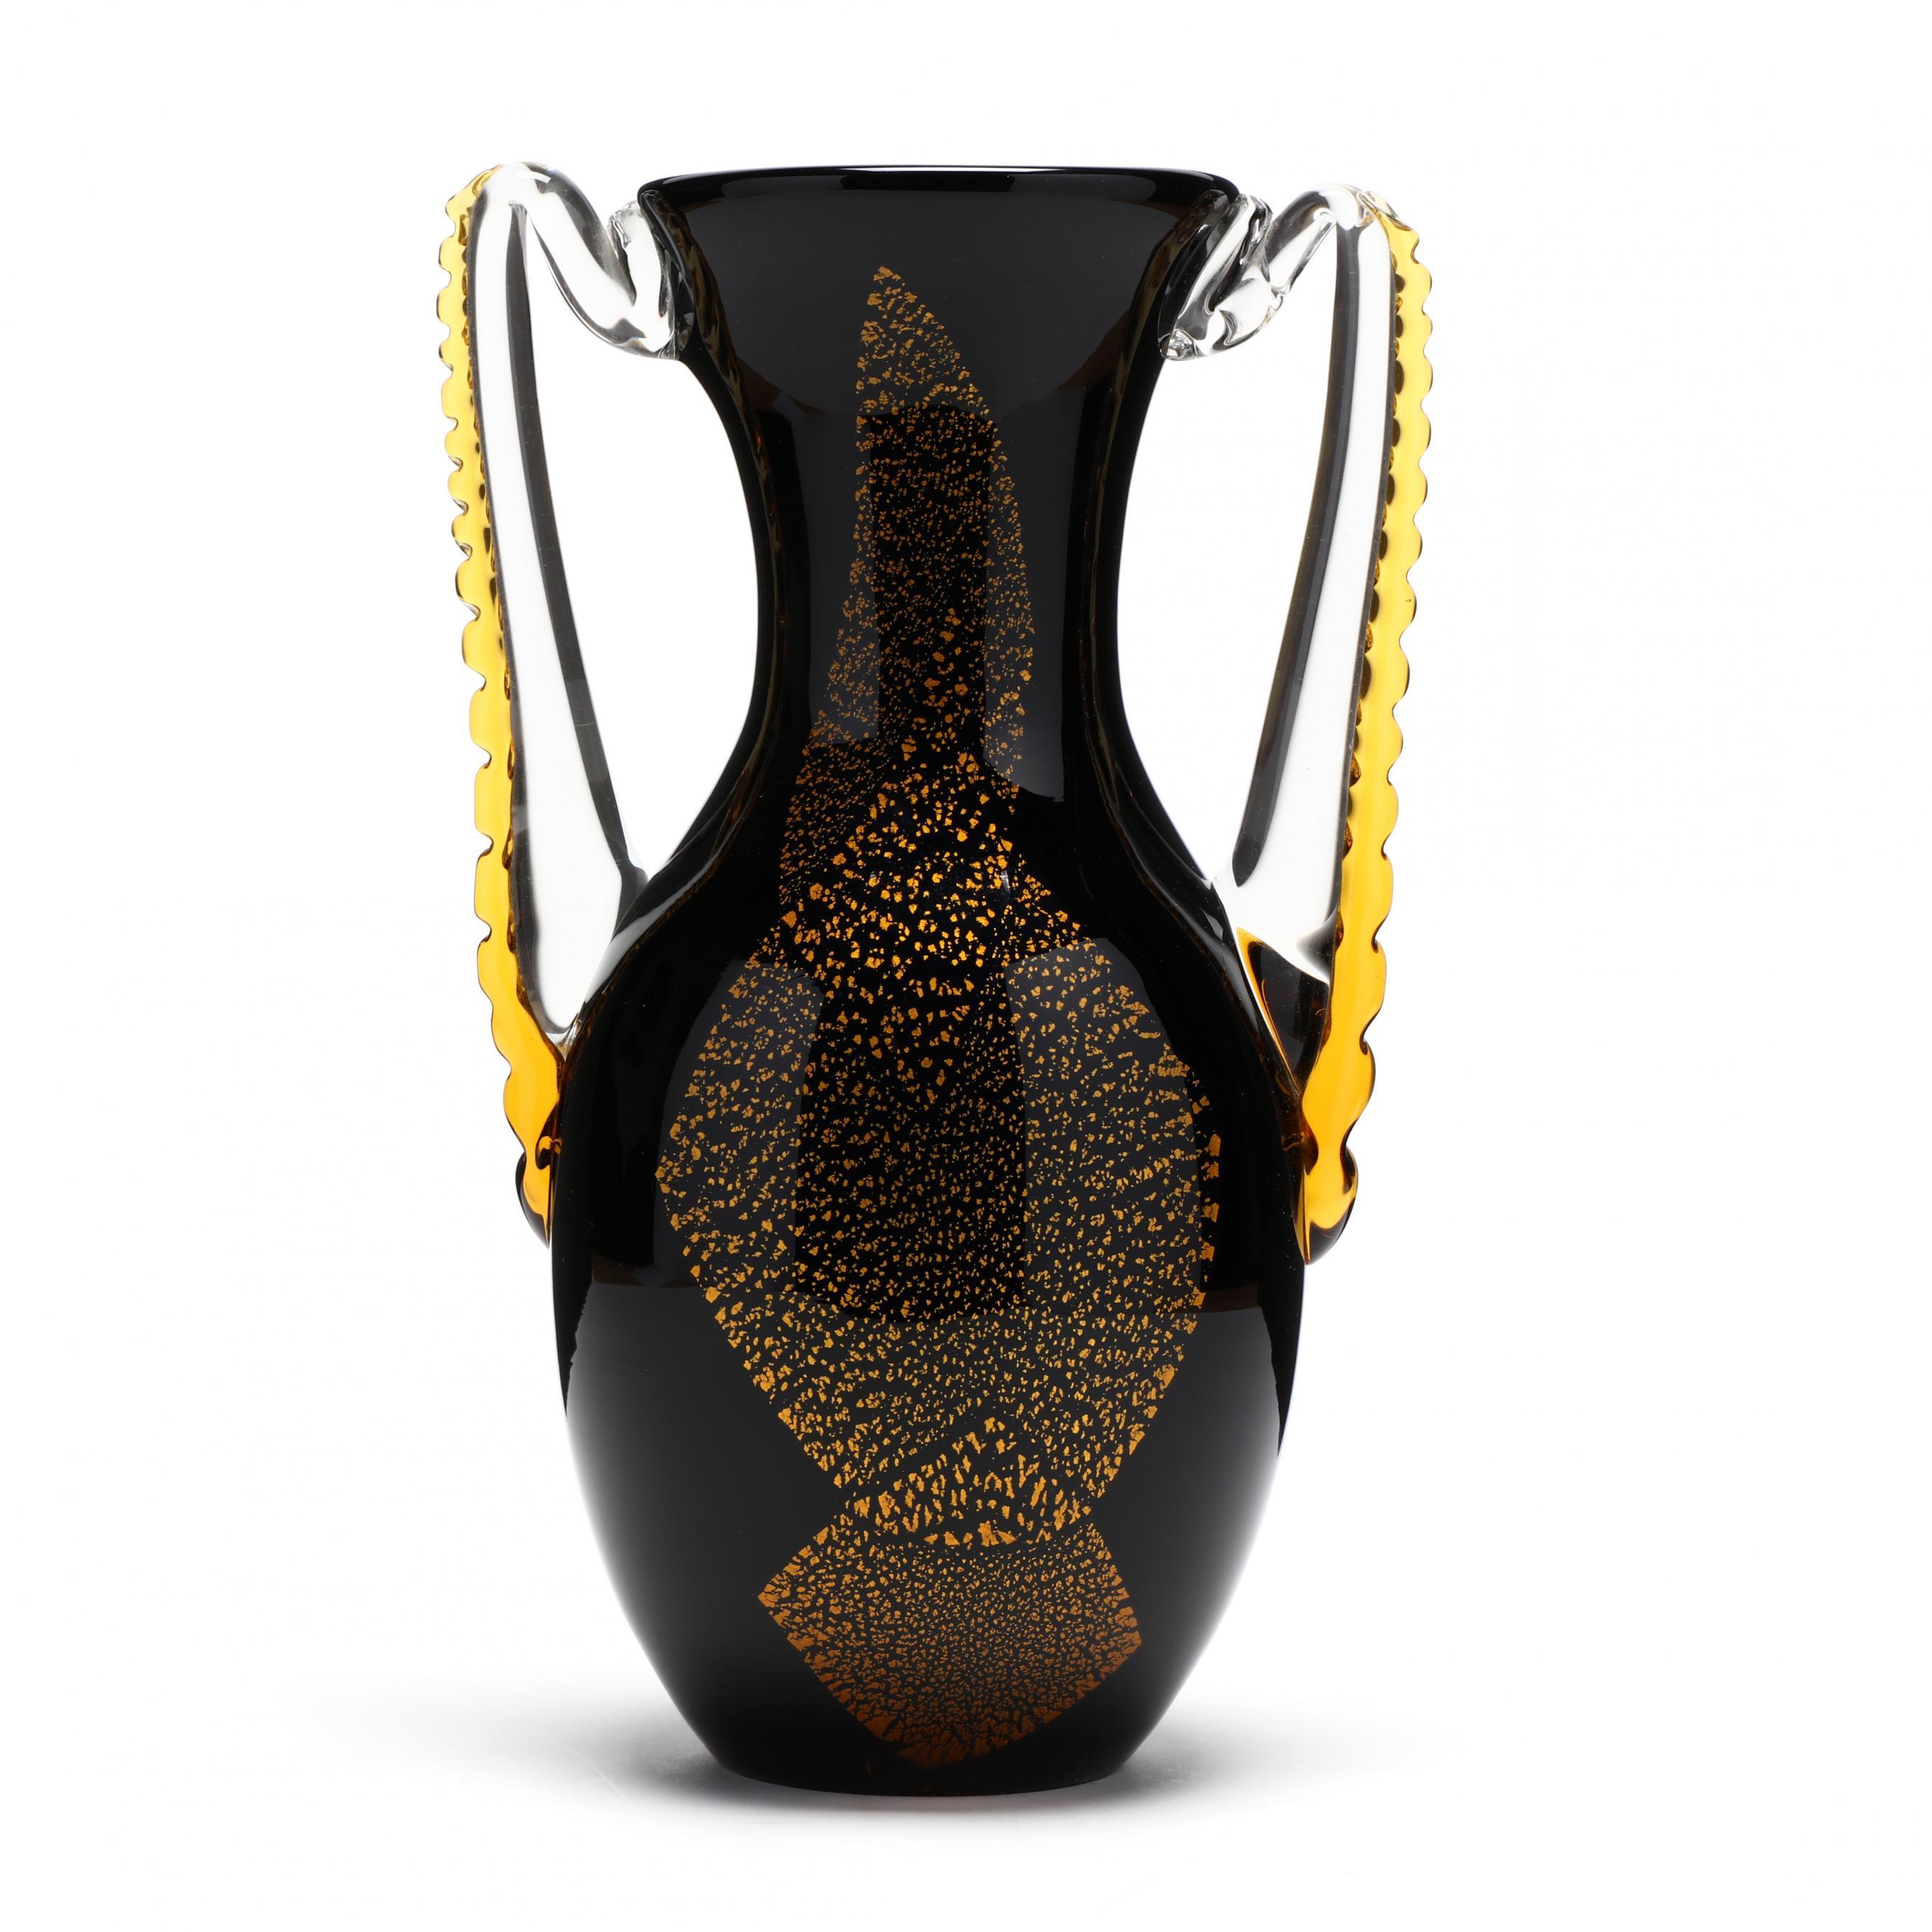 att-murano-double-handled-glass-vase